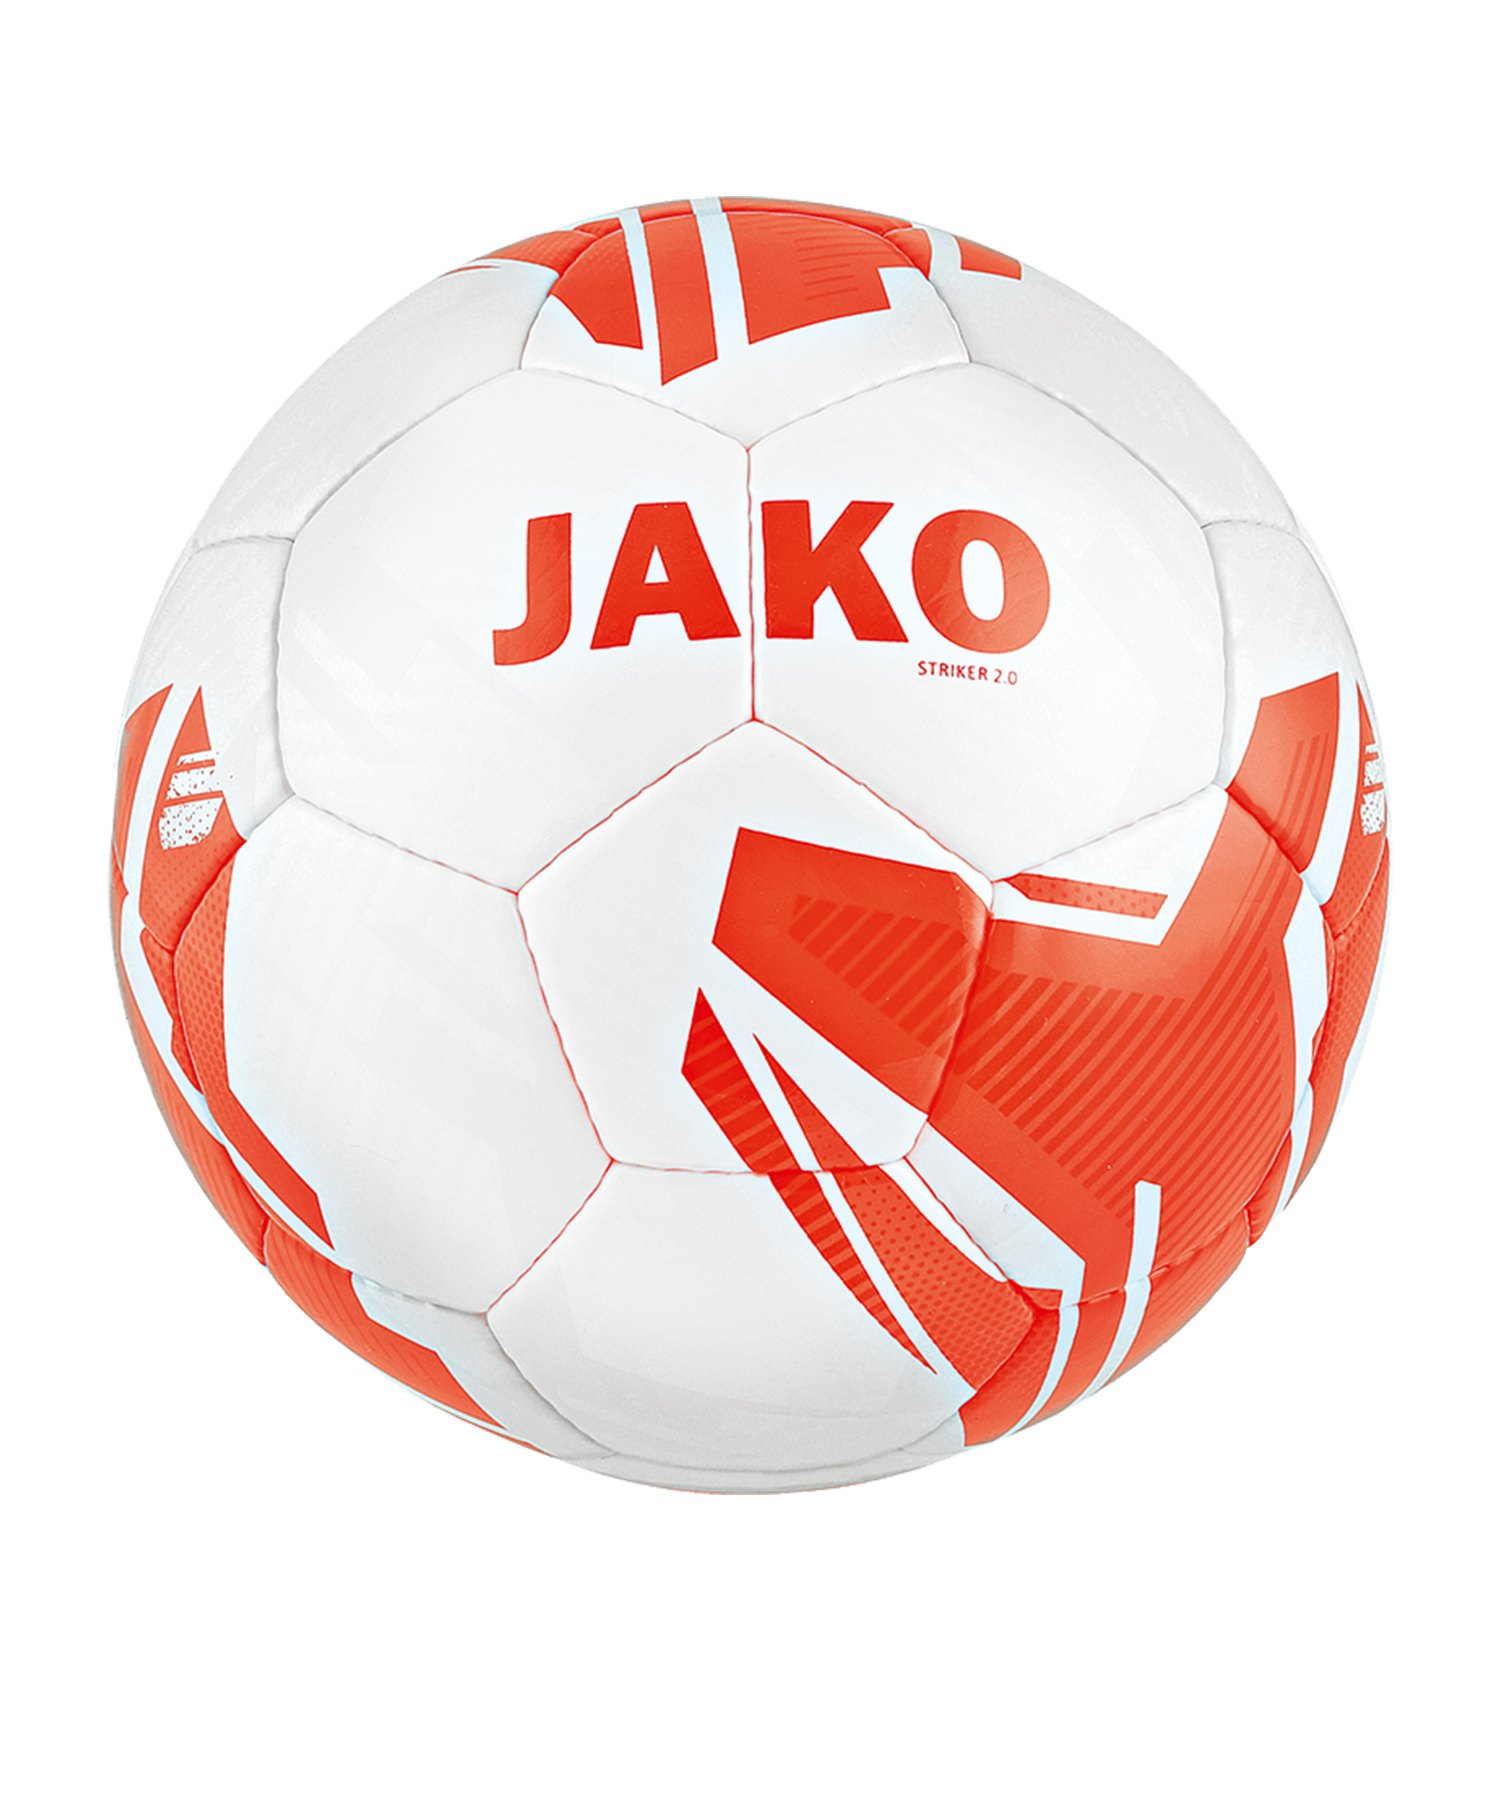 Jako Striker 2.0 Lightball MS 290 Gramm Gr. 5 F03 - Gelb